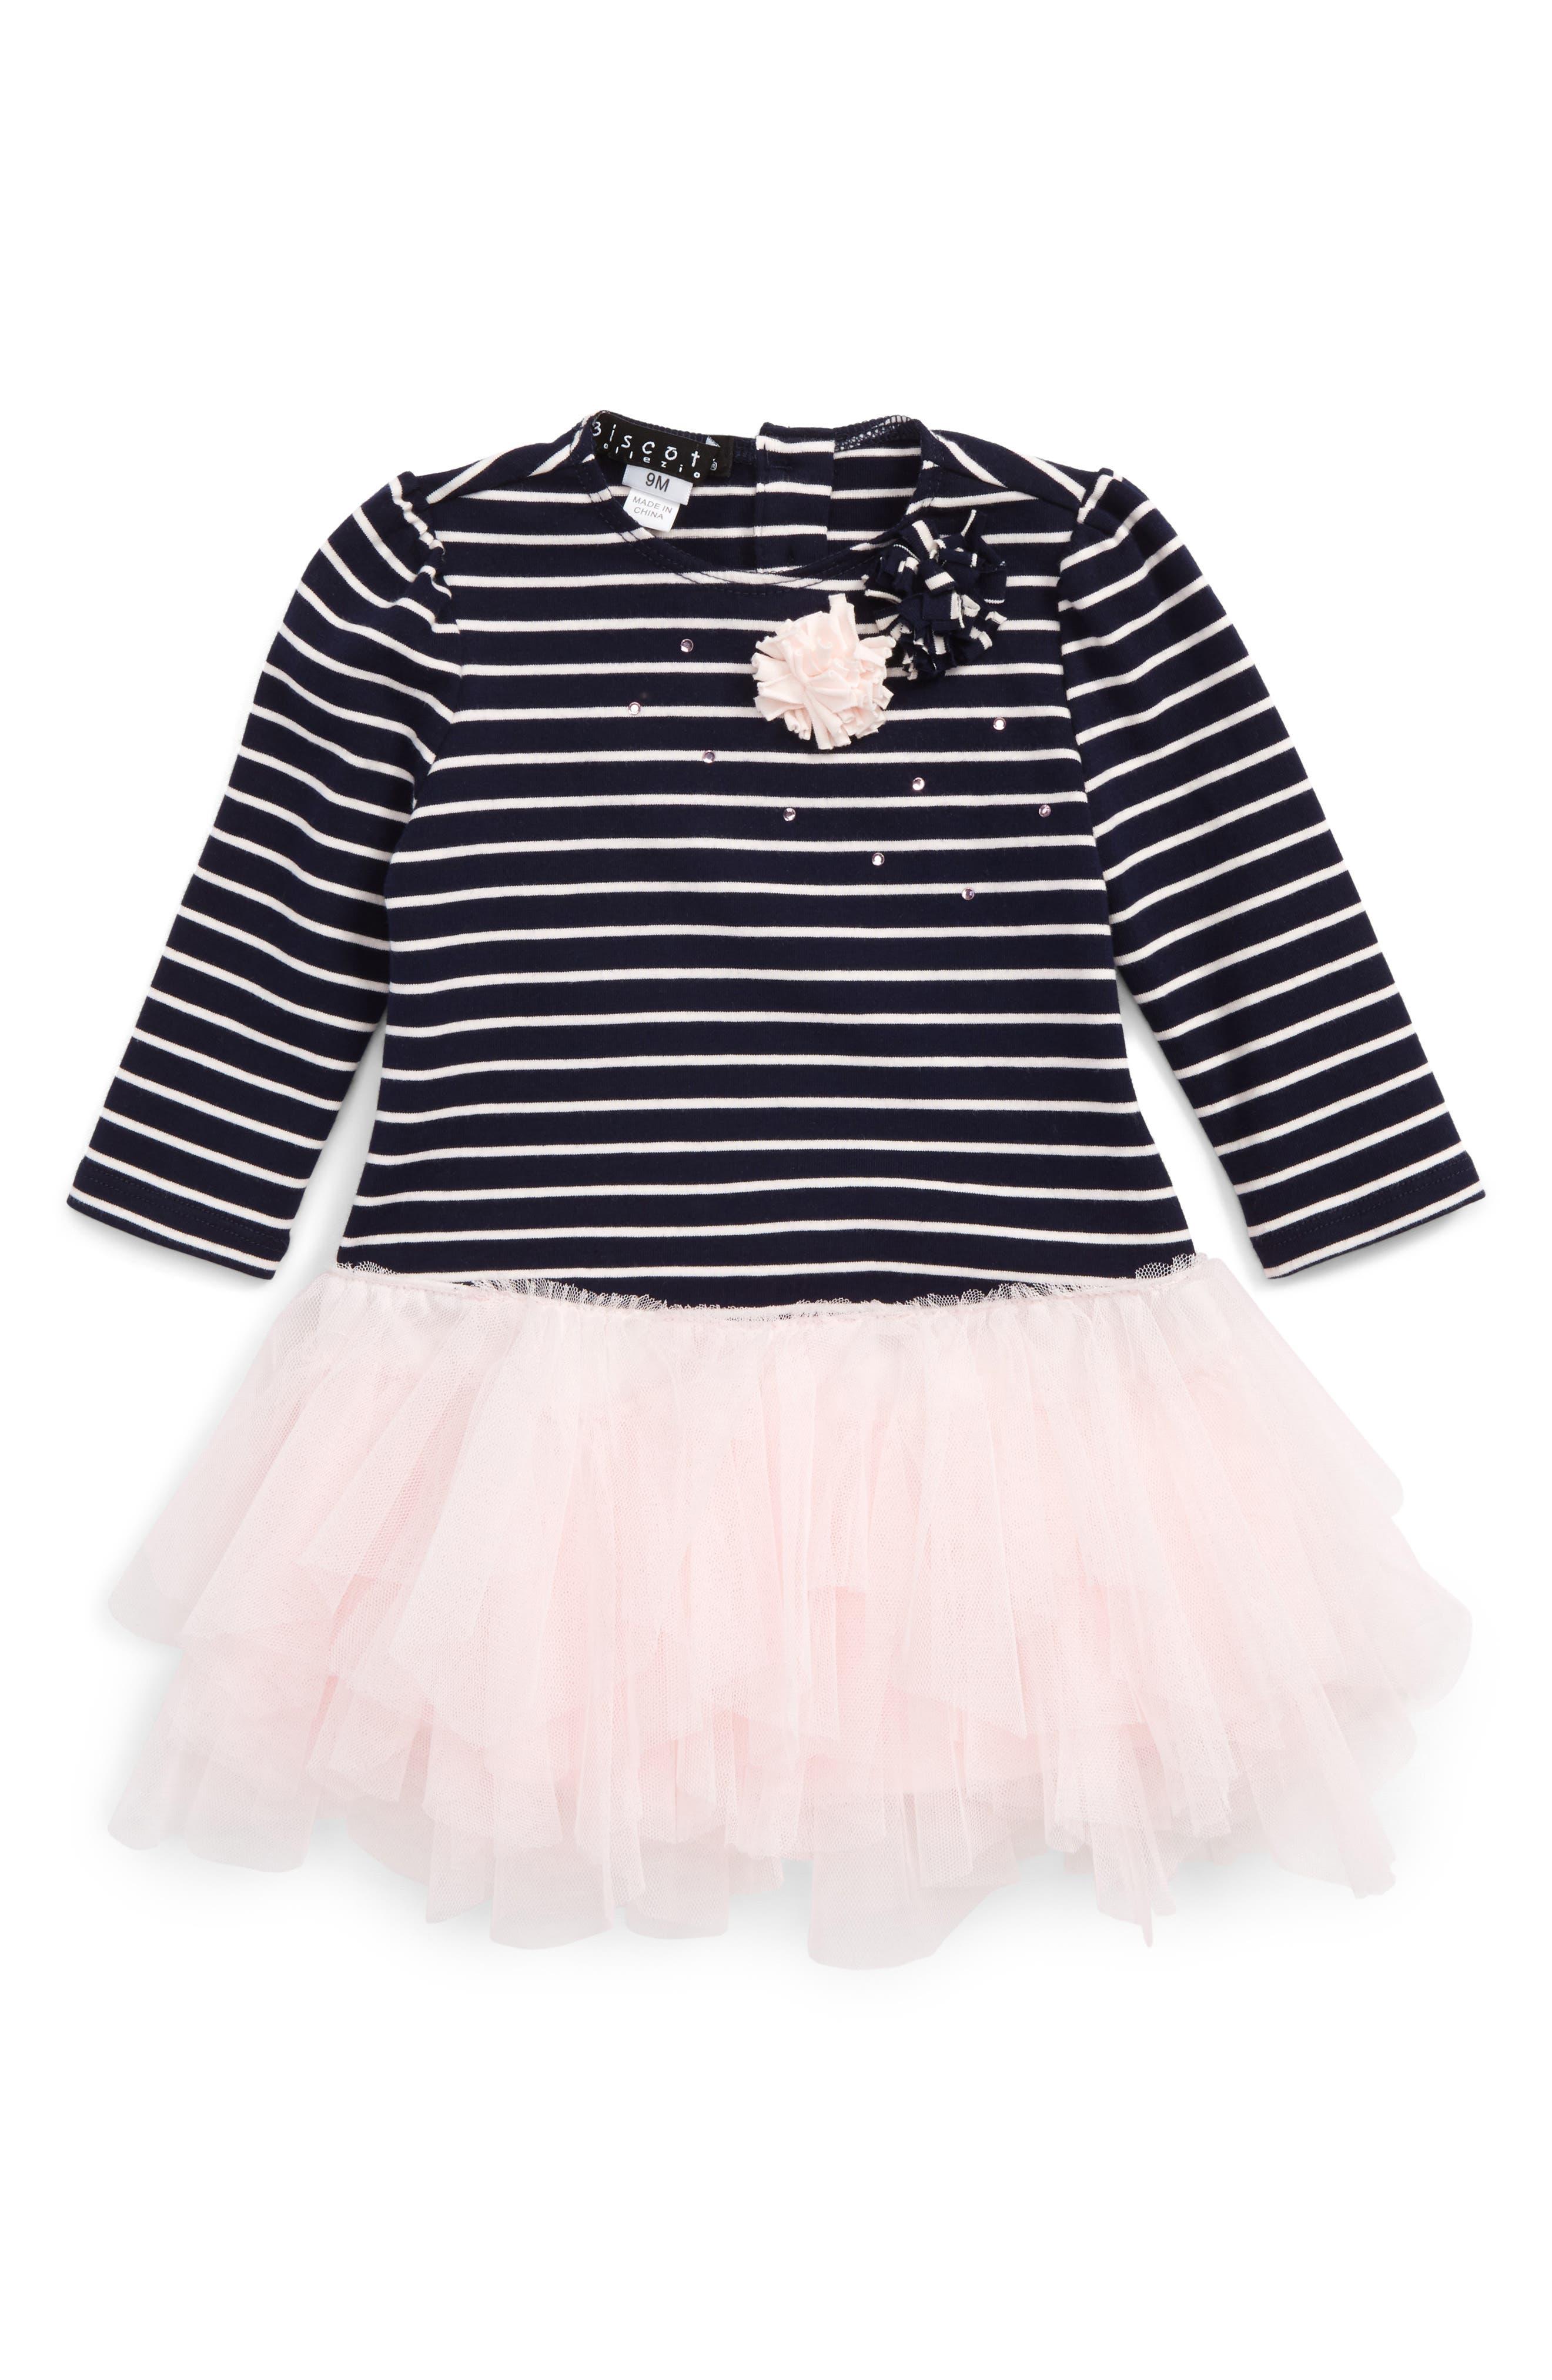 Alternate Image 1 Selected - Biscotti Stripe Bodice Tutu Dress (Baby Girls)